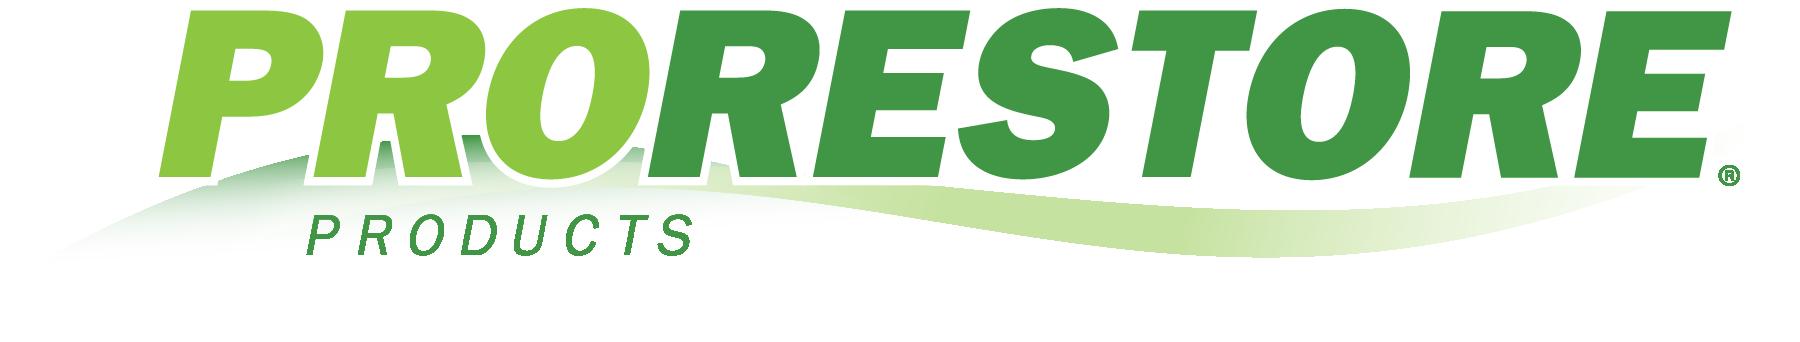 prorestore-logo-high-resss123.png